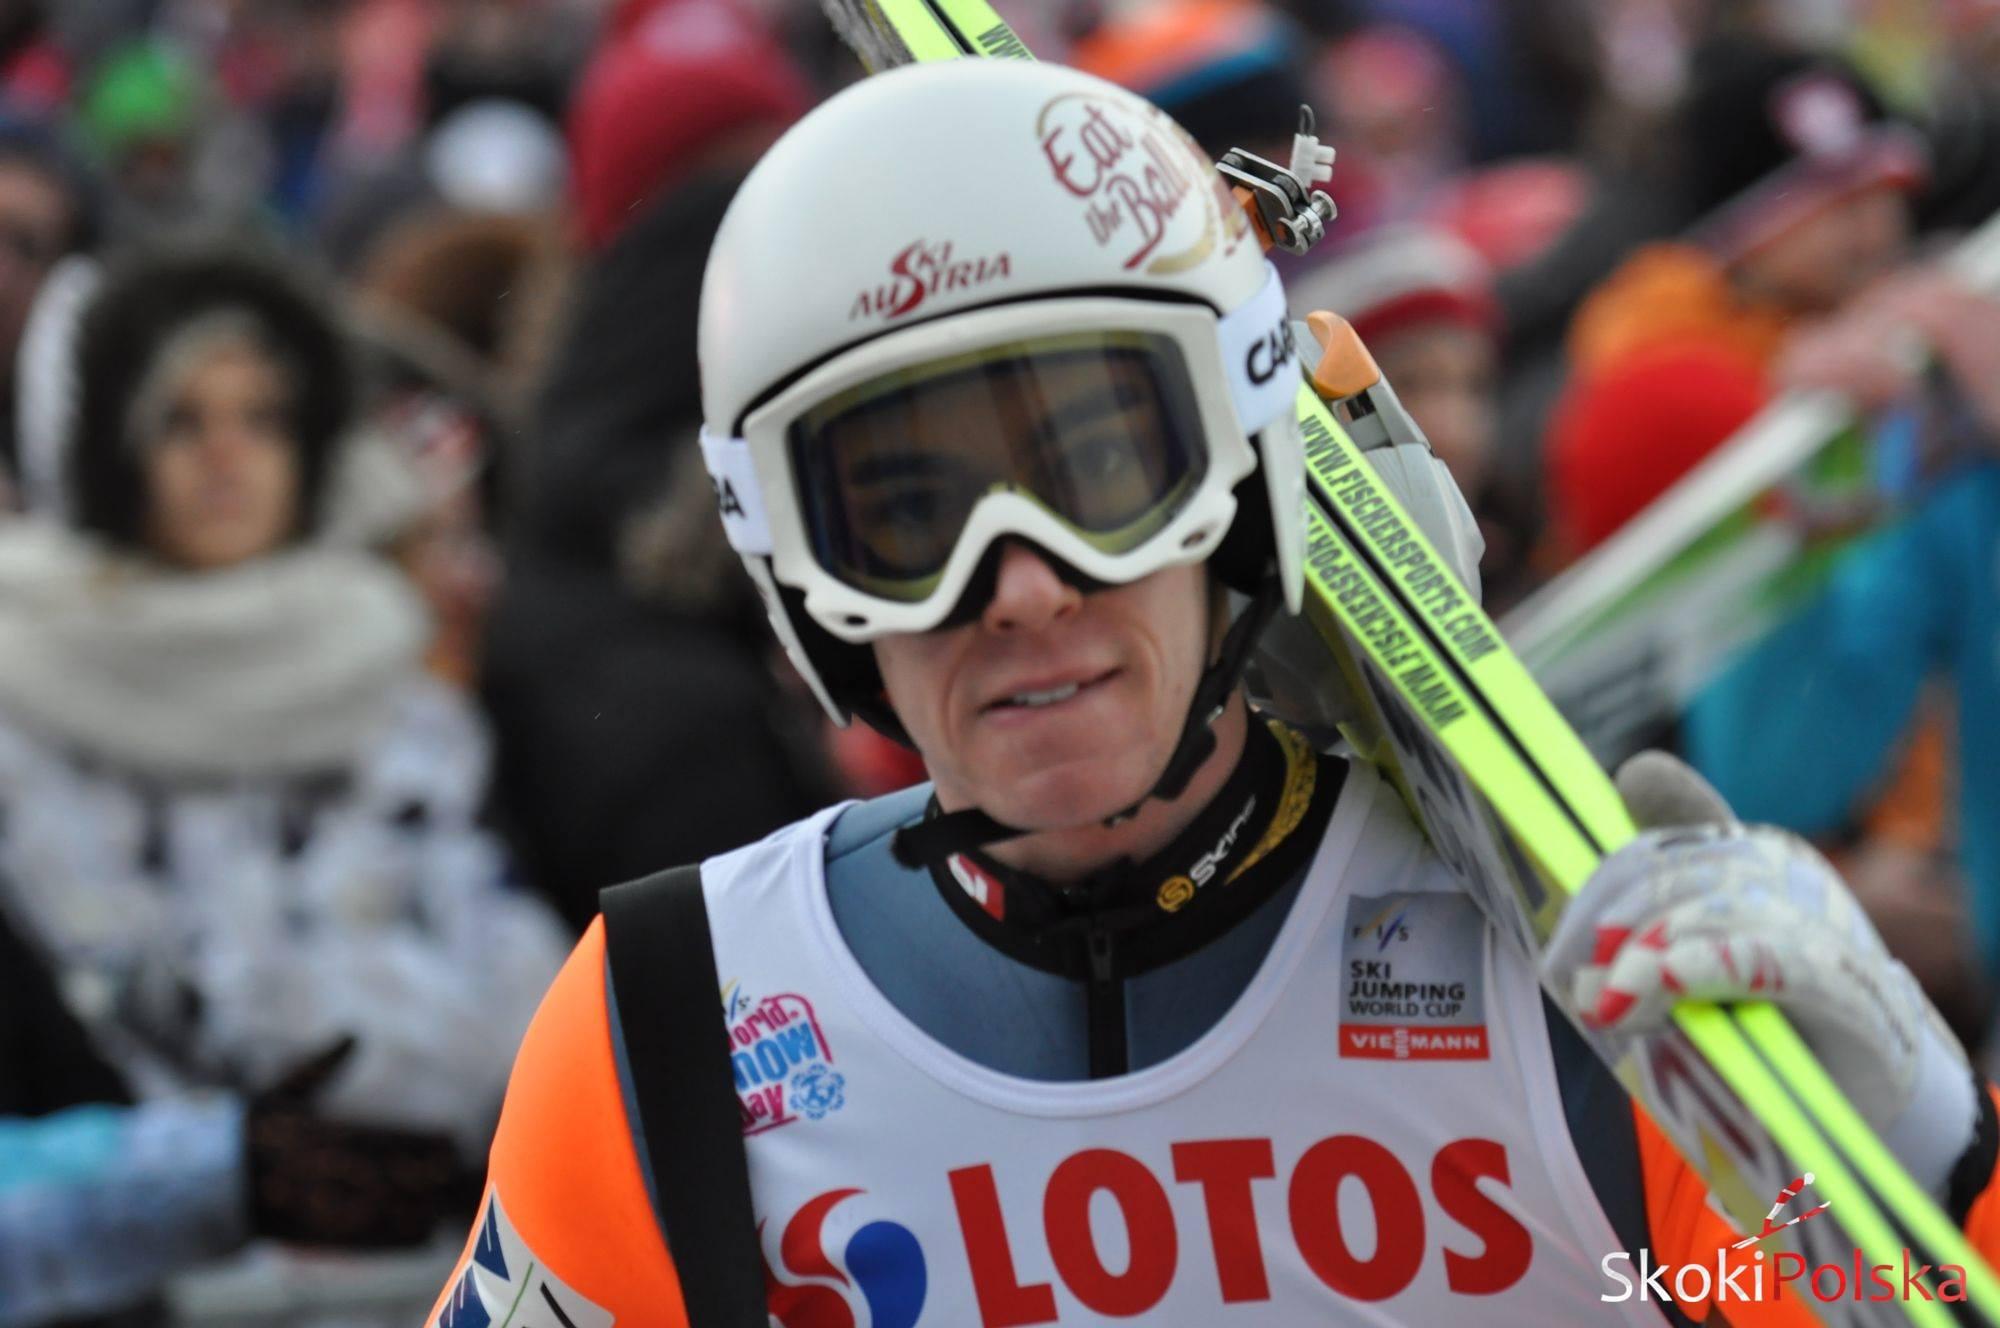 Kraft Stefan B.Leja  - TCS Oberstdorf: Seria próbna dla Krafta, Żyła w dziesiątce